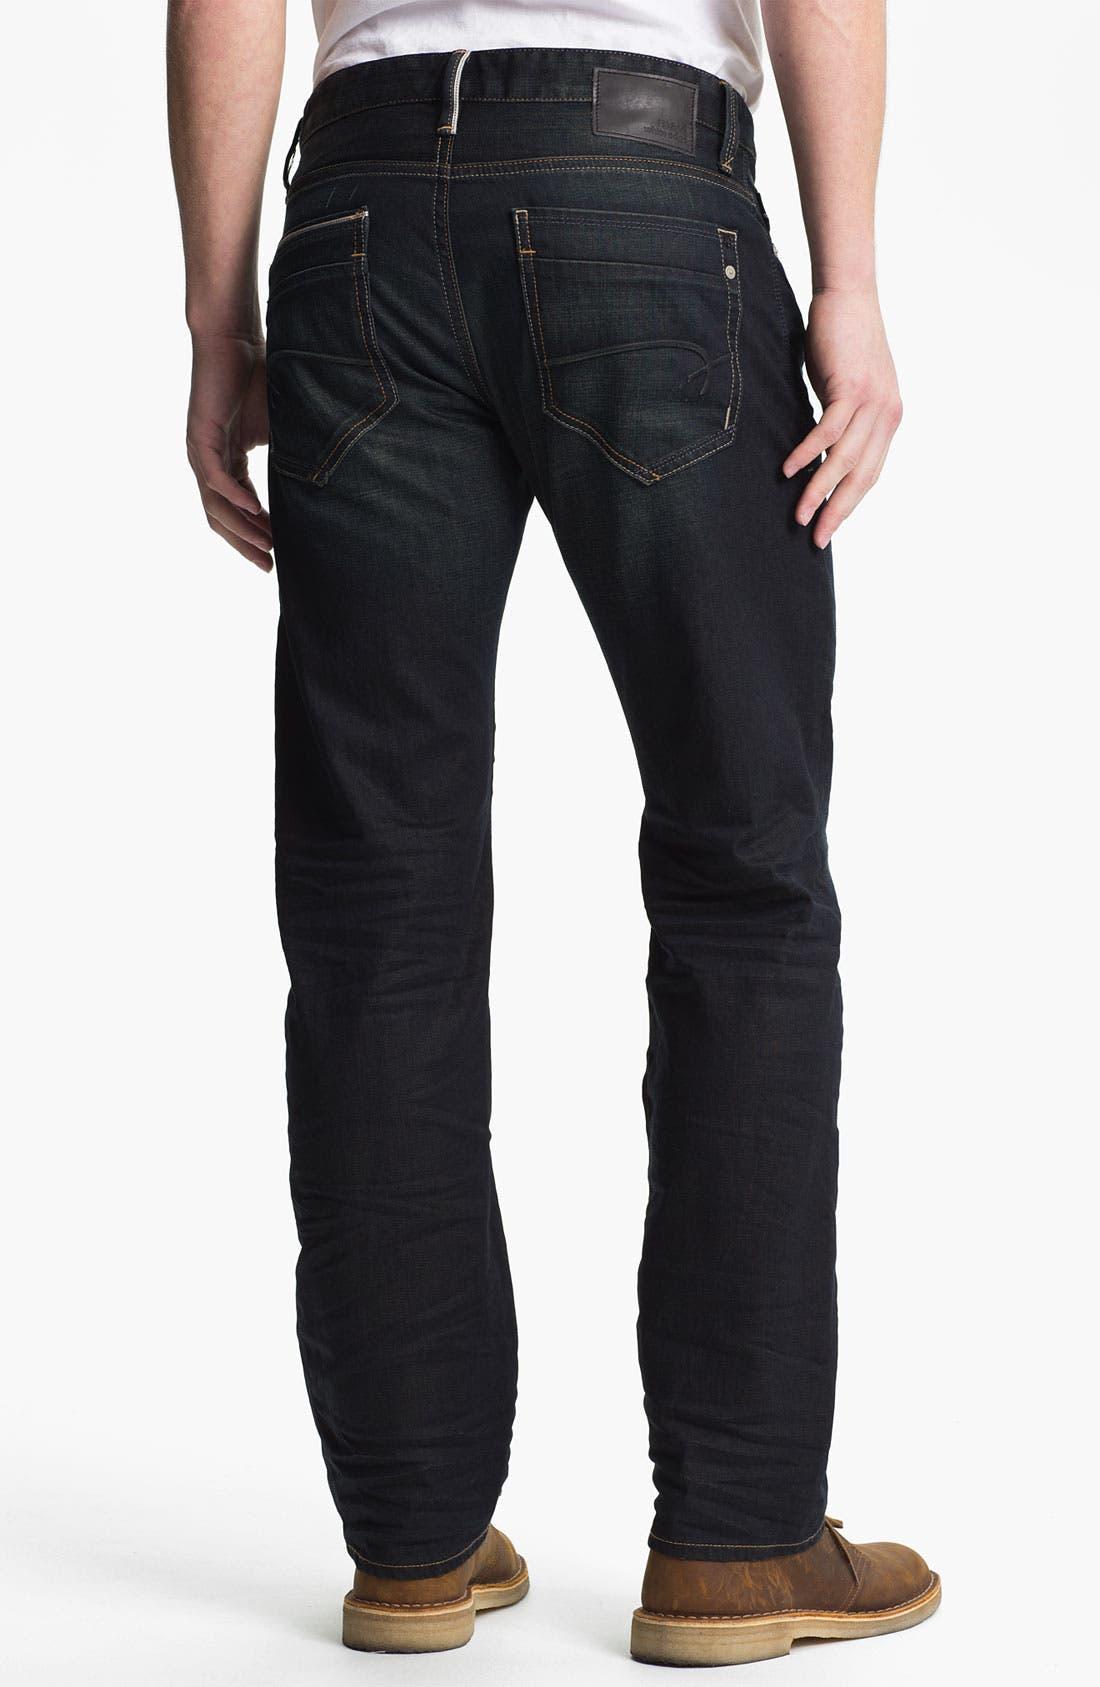 Alternate Image 1 Selected - Mavi Jeans 'Zach' Straight Leg Jeans (Smoke White Edge)